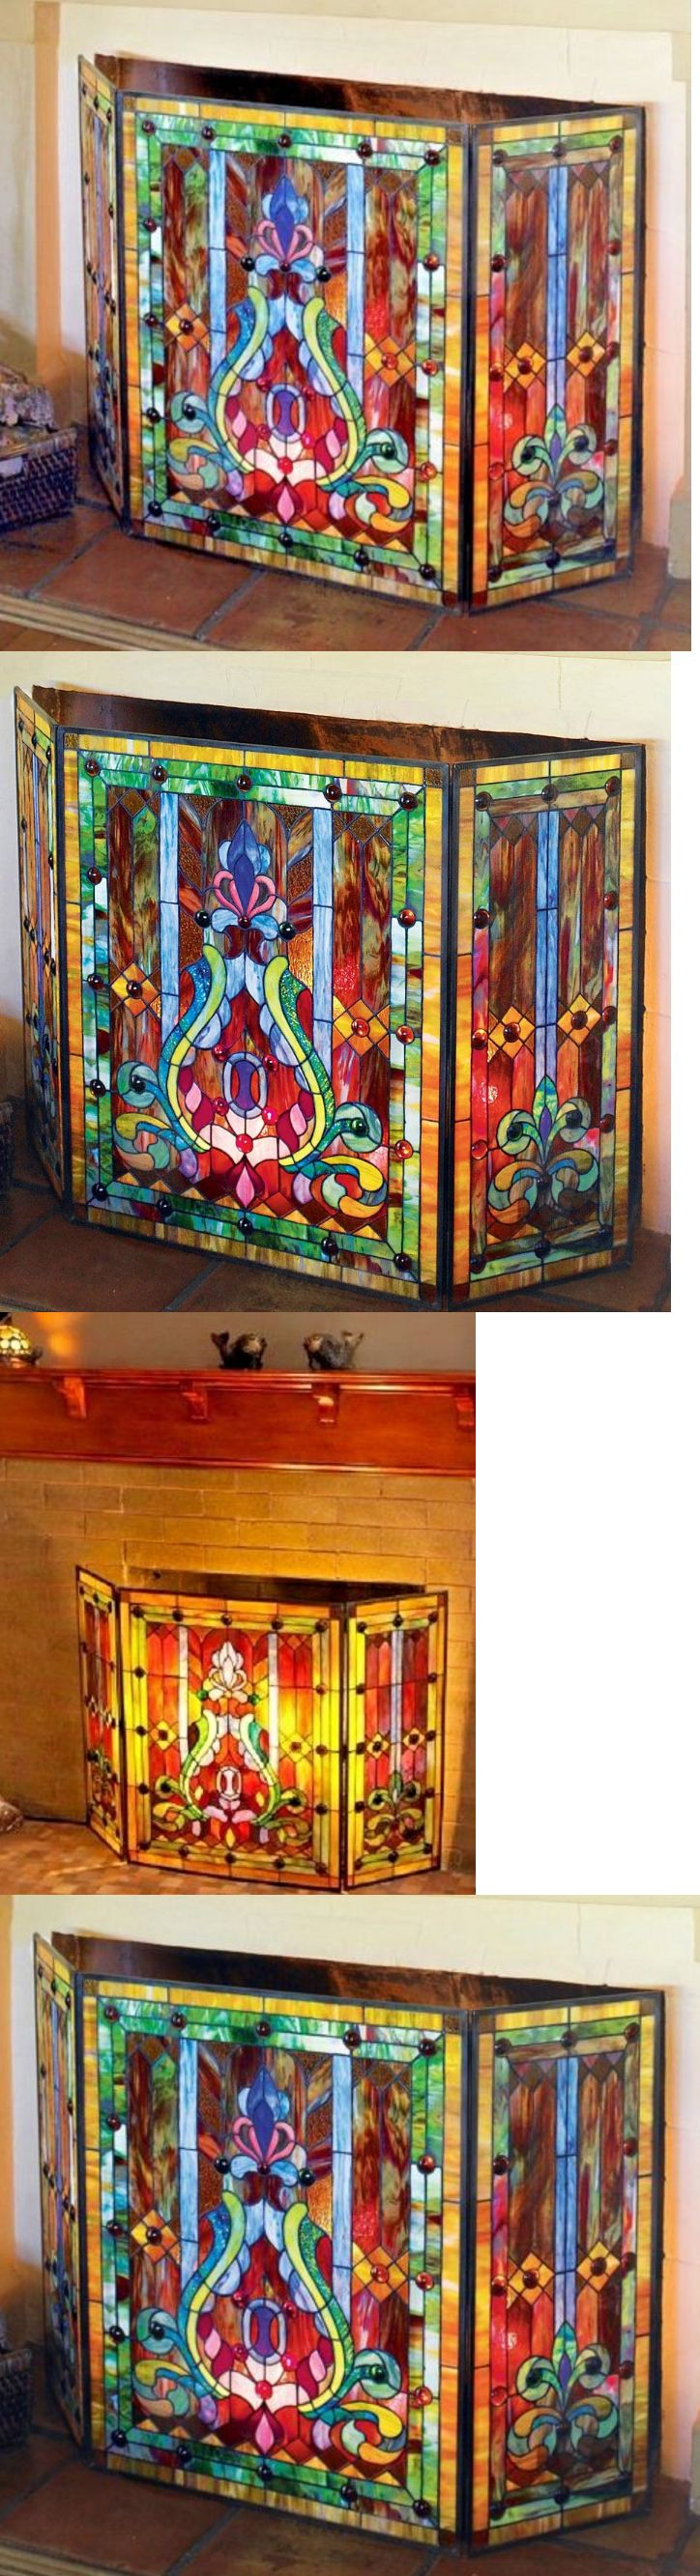 best 25+ decorative fireplace screens ideas on pinterest